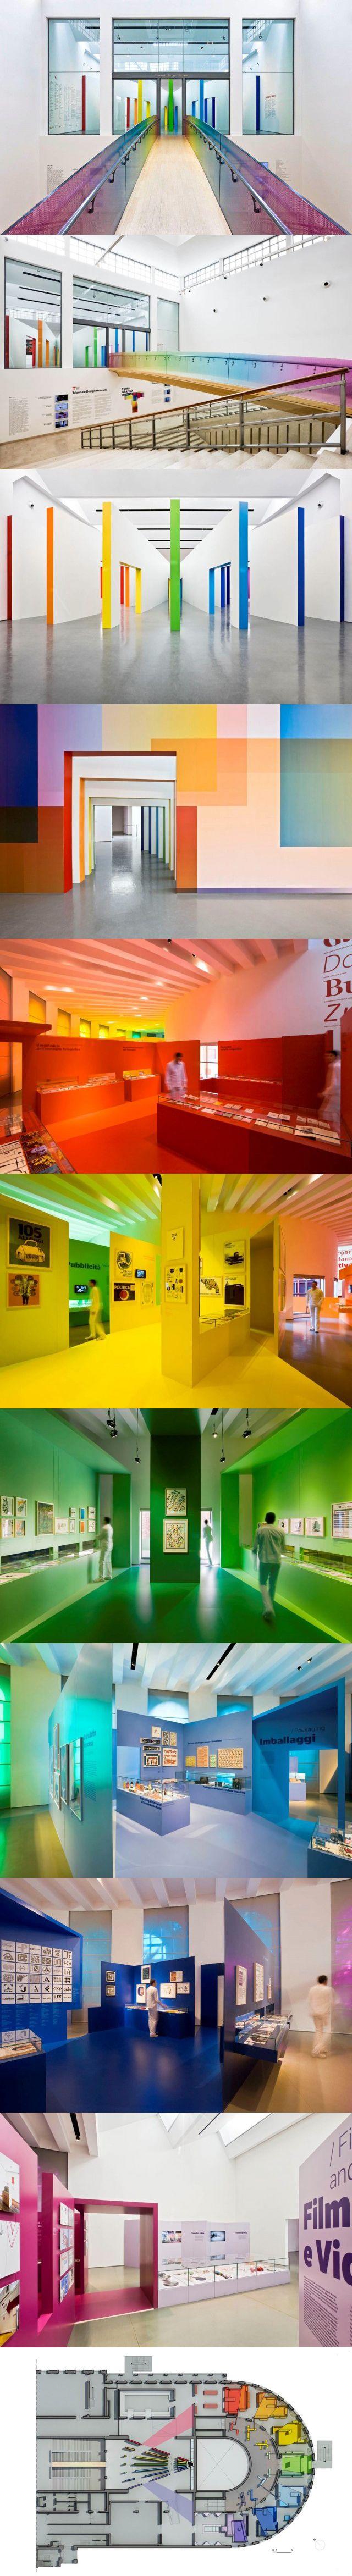 The Brand Shop @ Triennale Design Museum